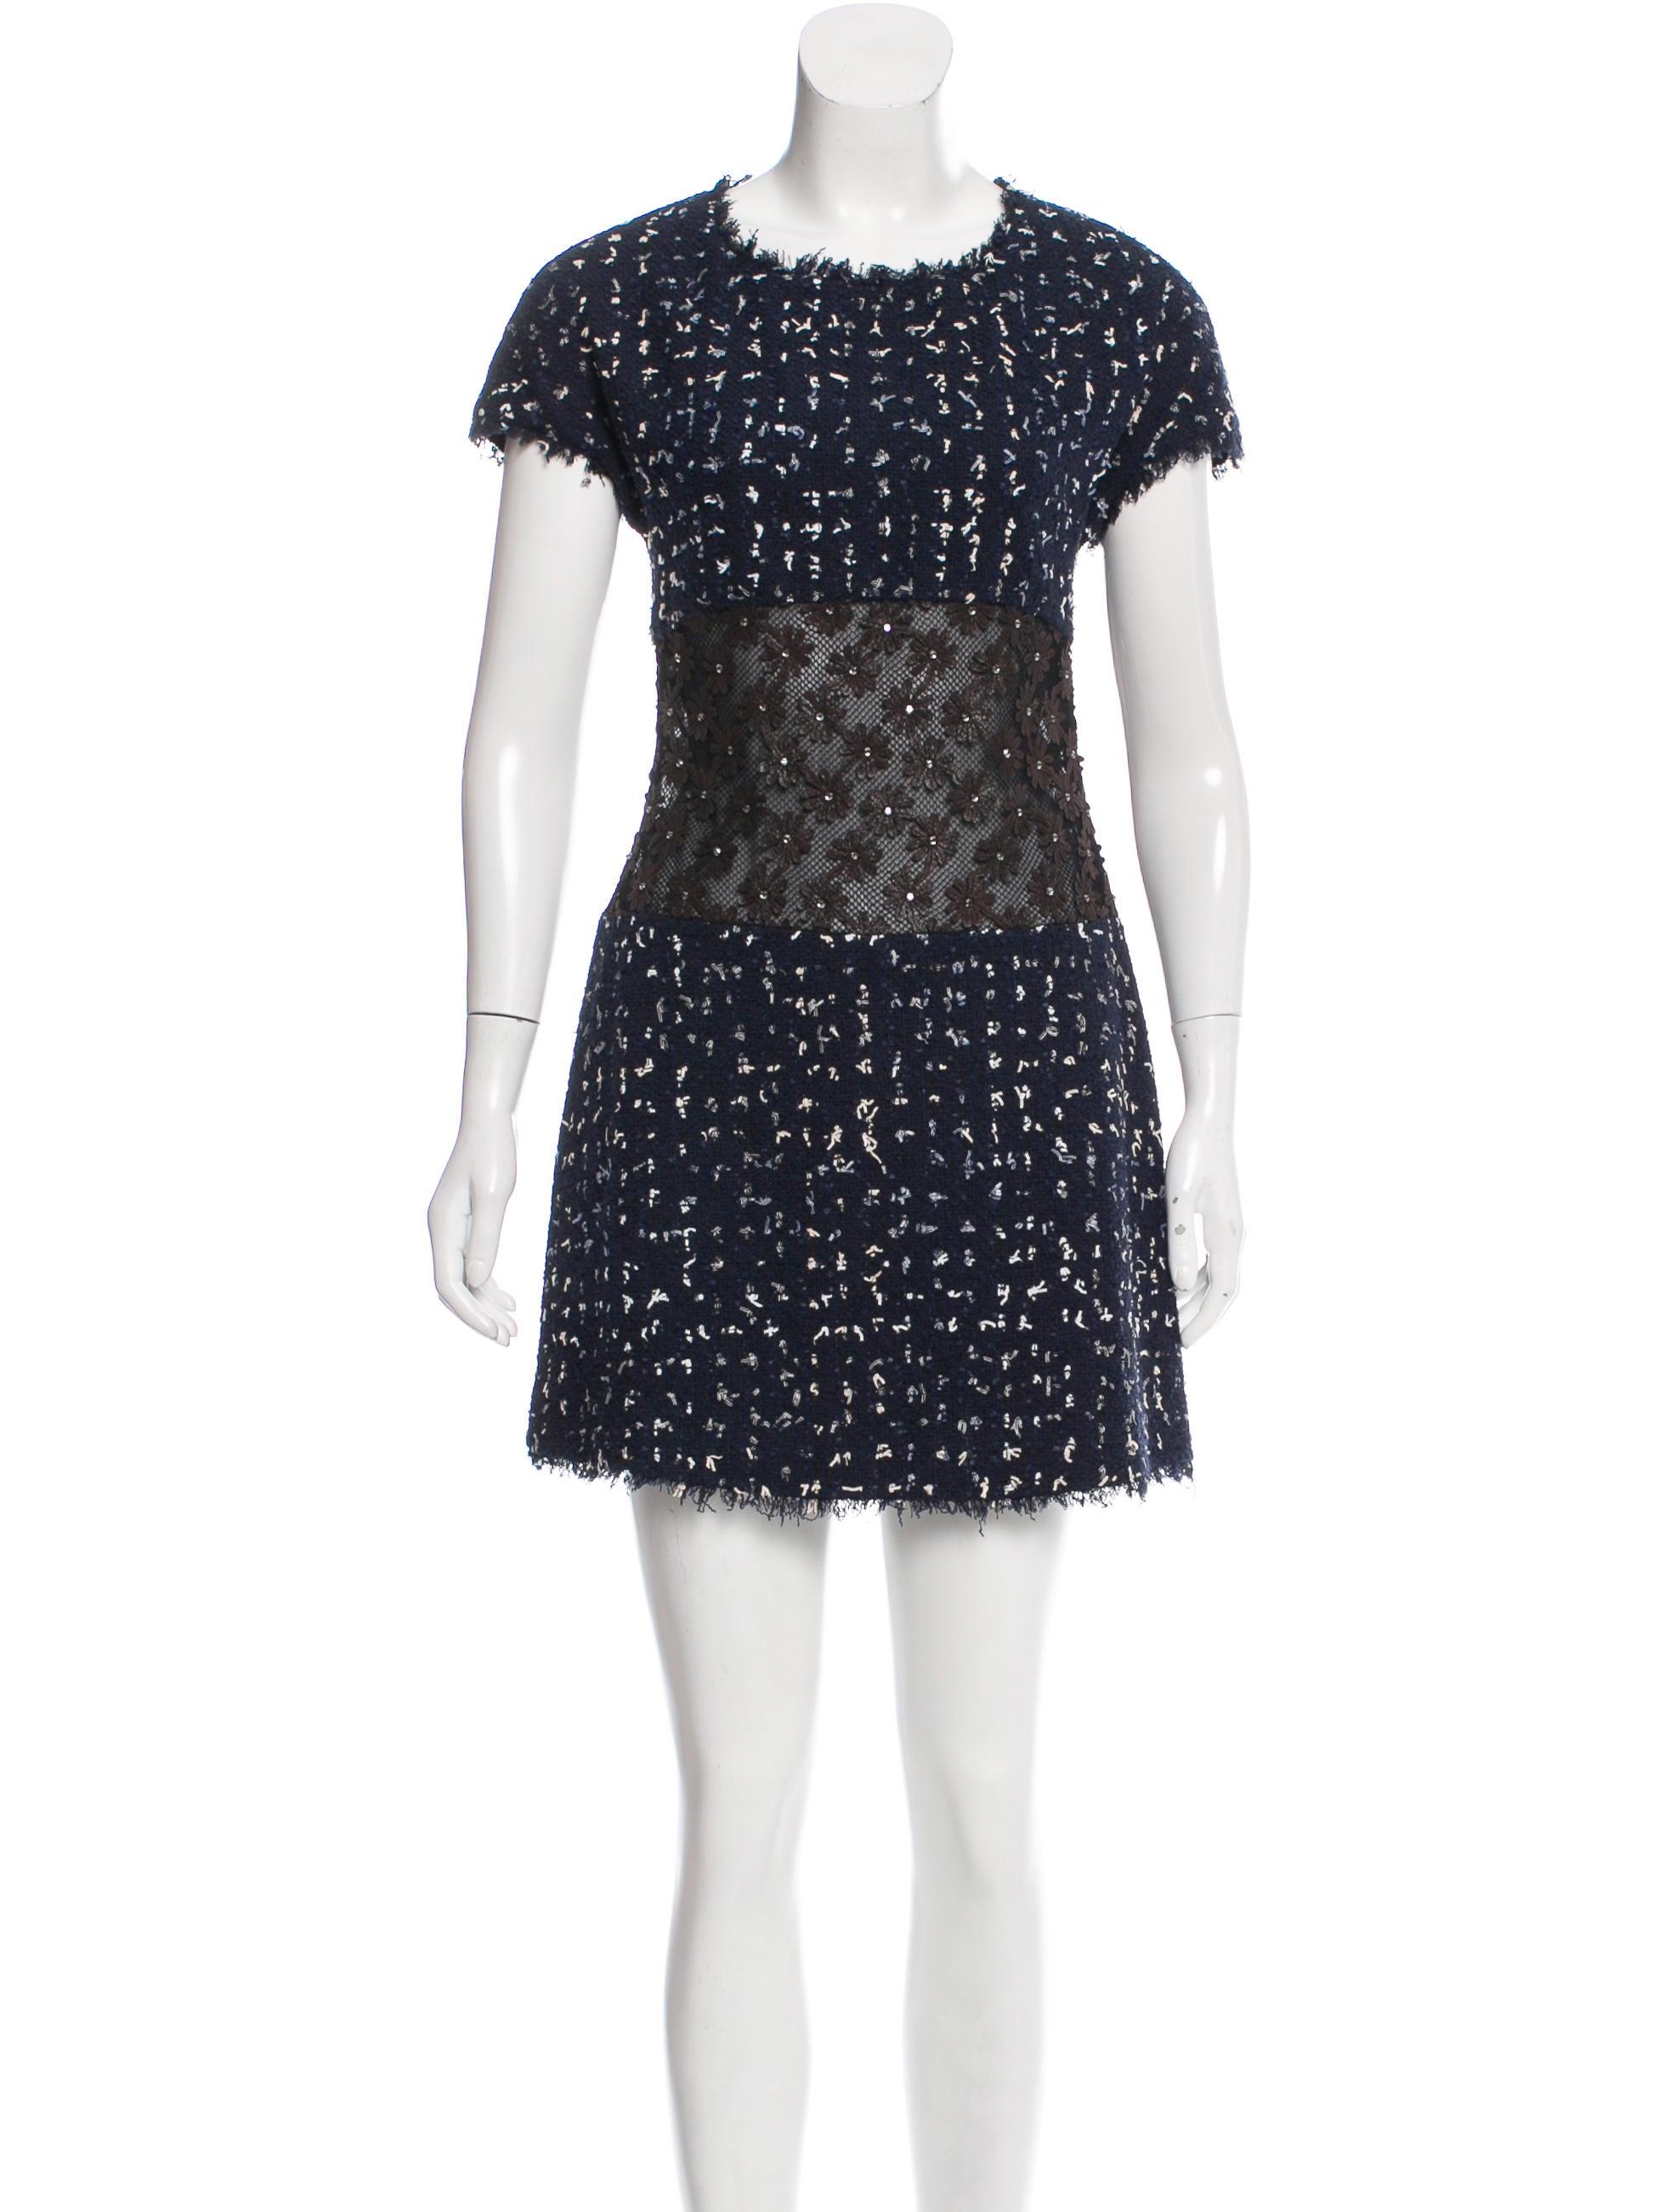 Chanel Camellia Tweed Dress - Clothing - CHA200108